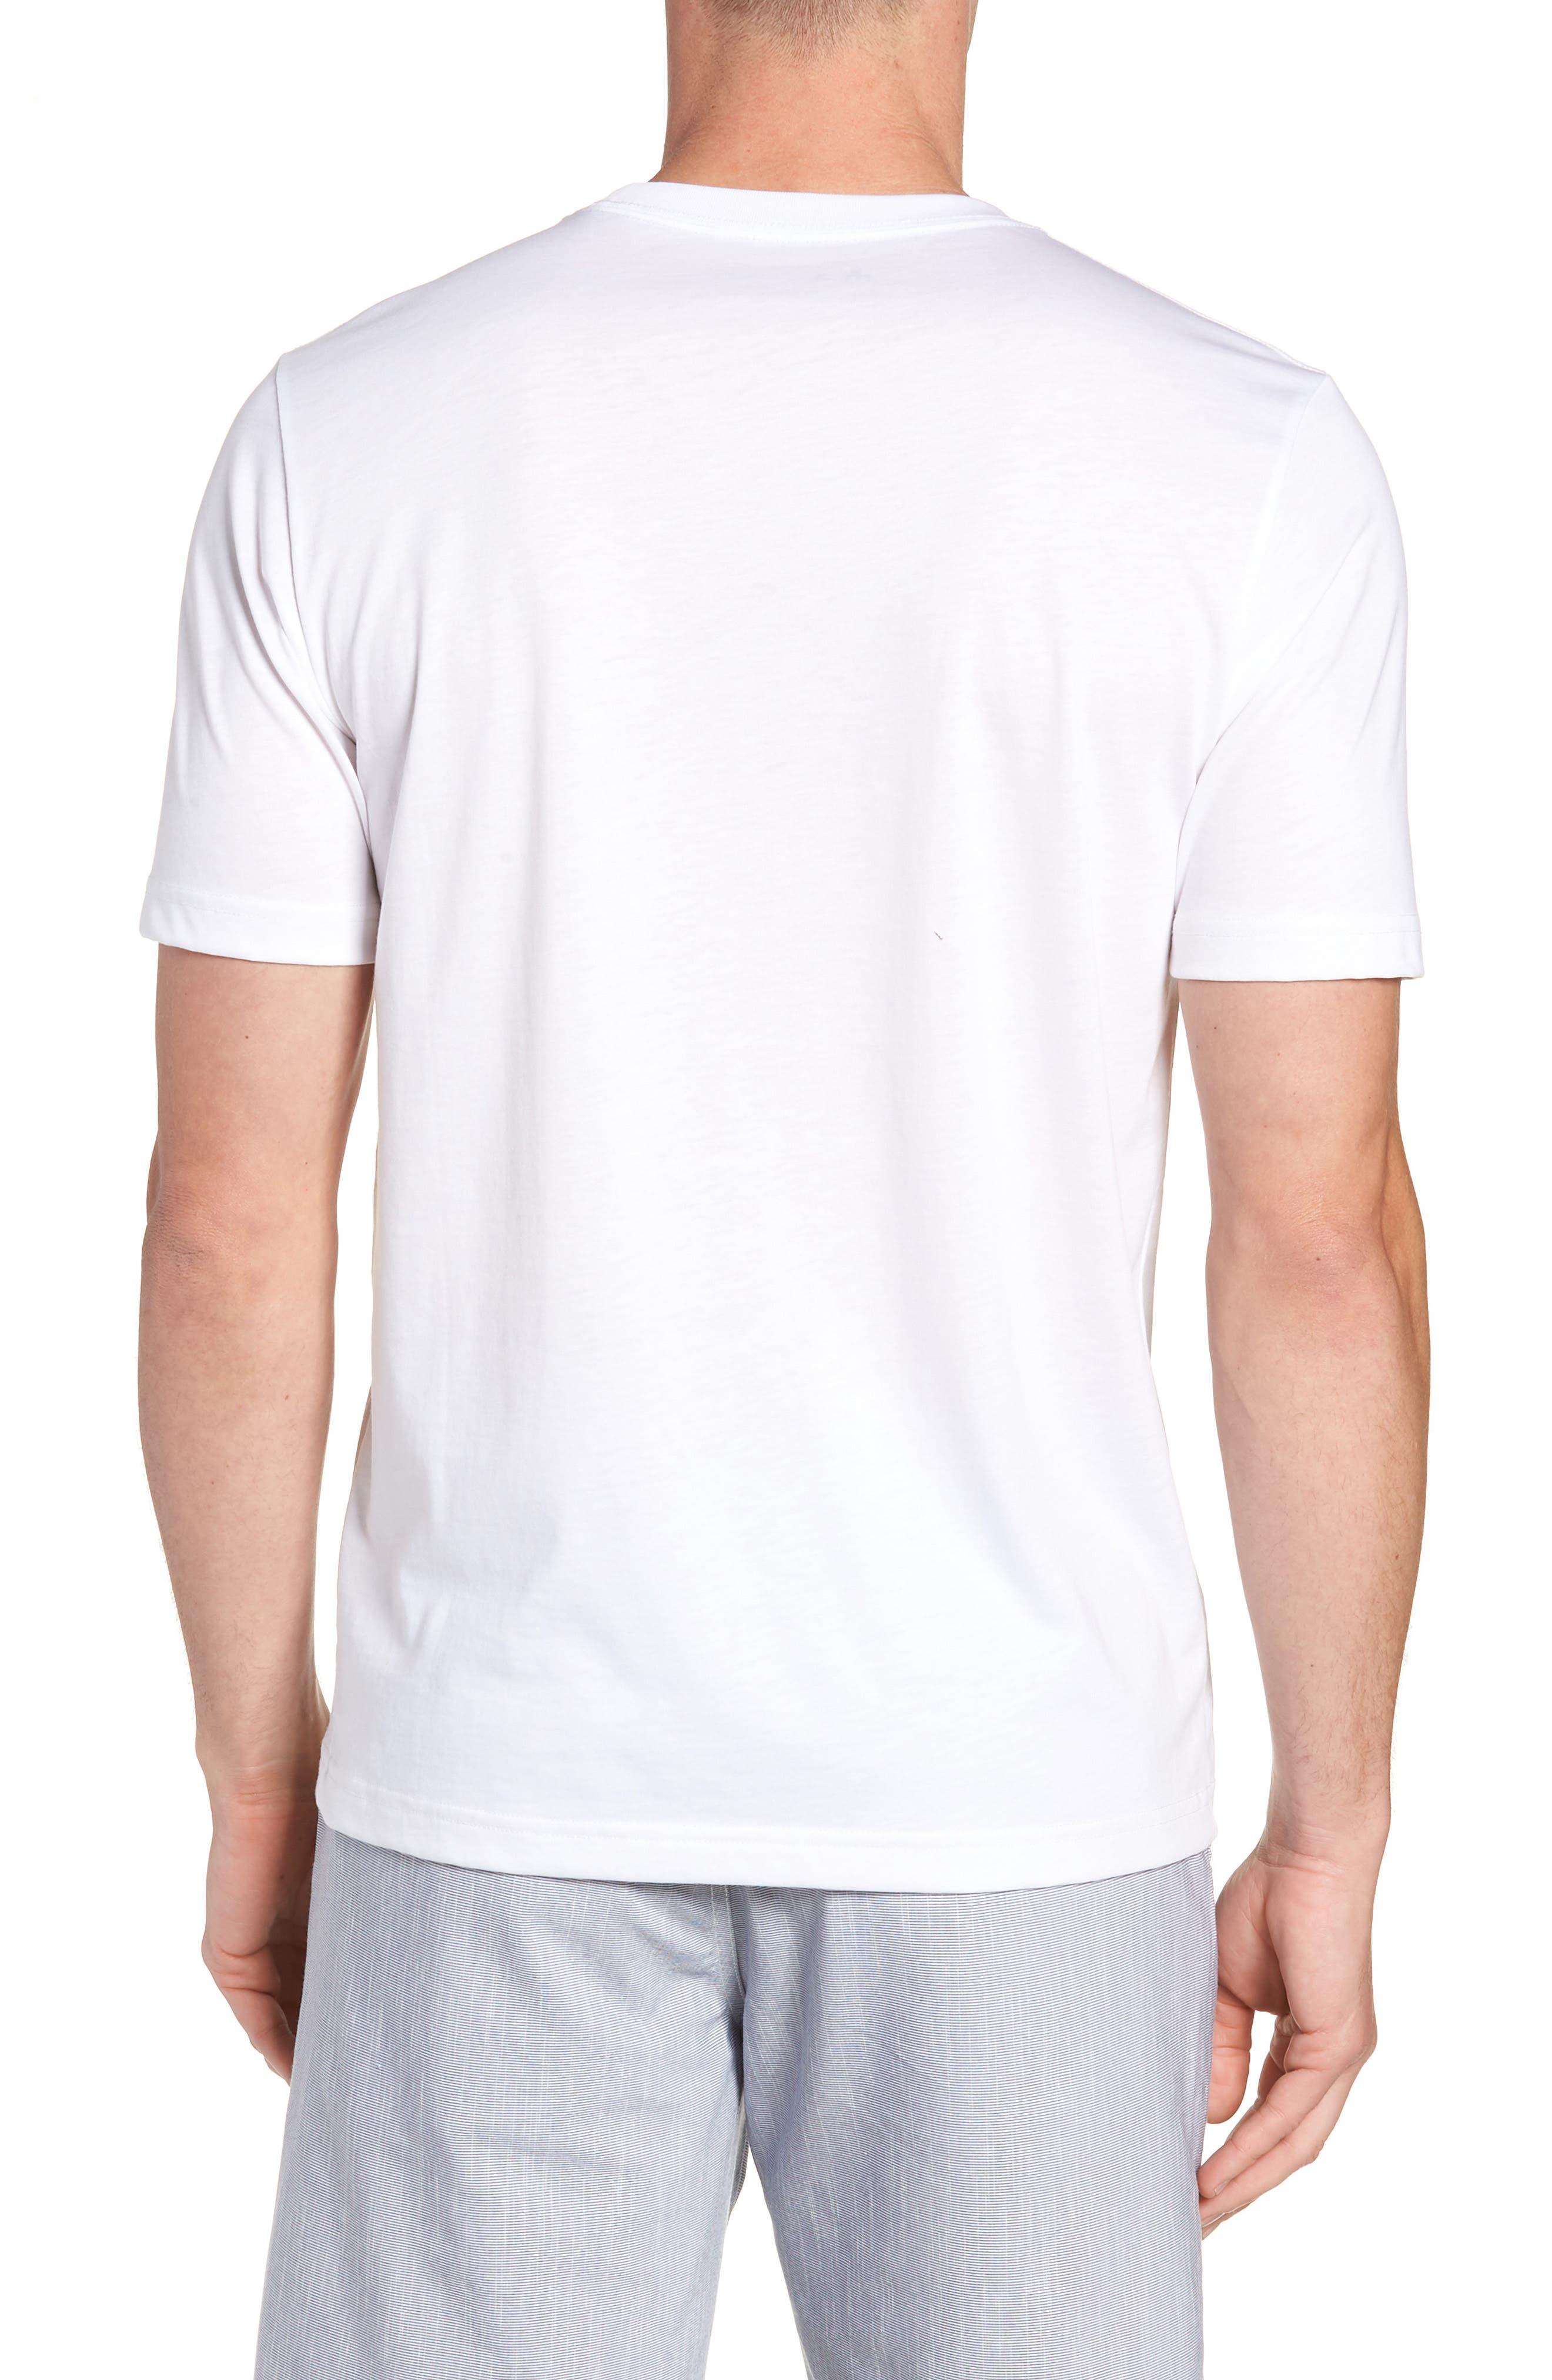 Muska Pocket T-Shirt,                             Alternate thumbnail 2, color,                             100